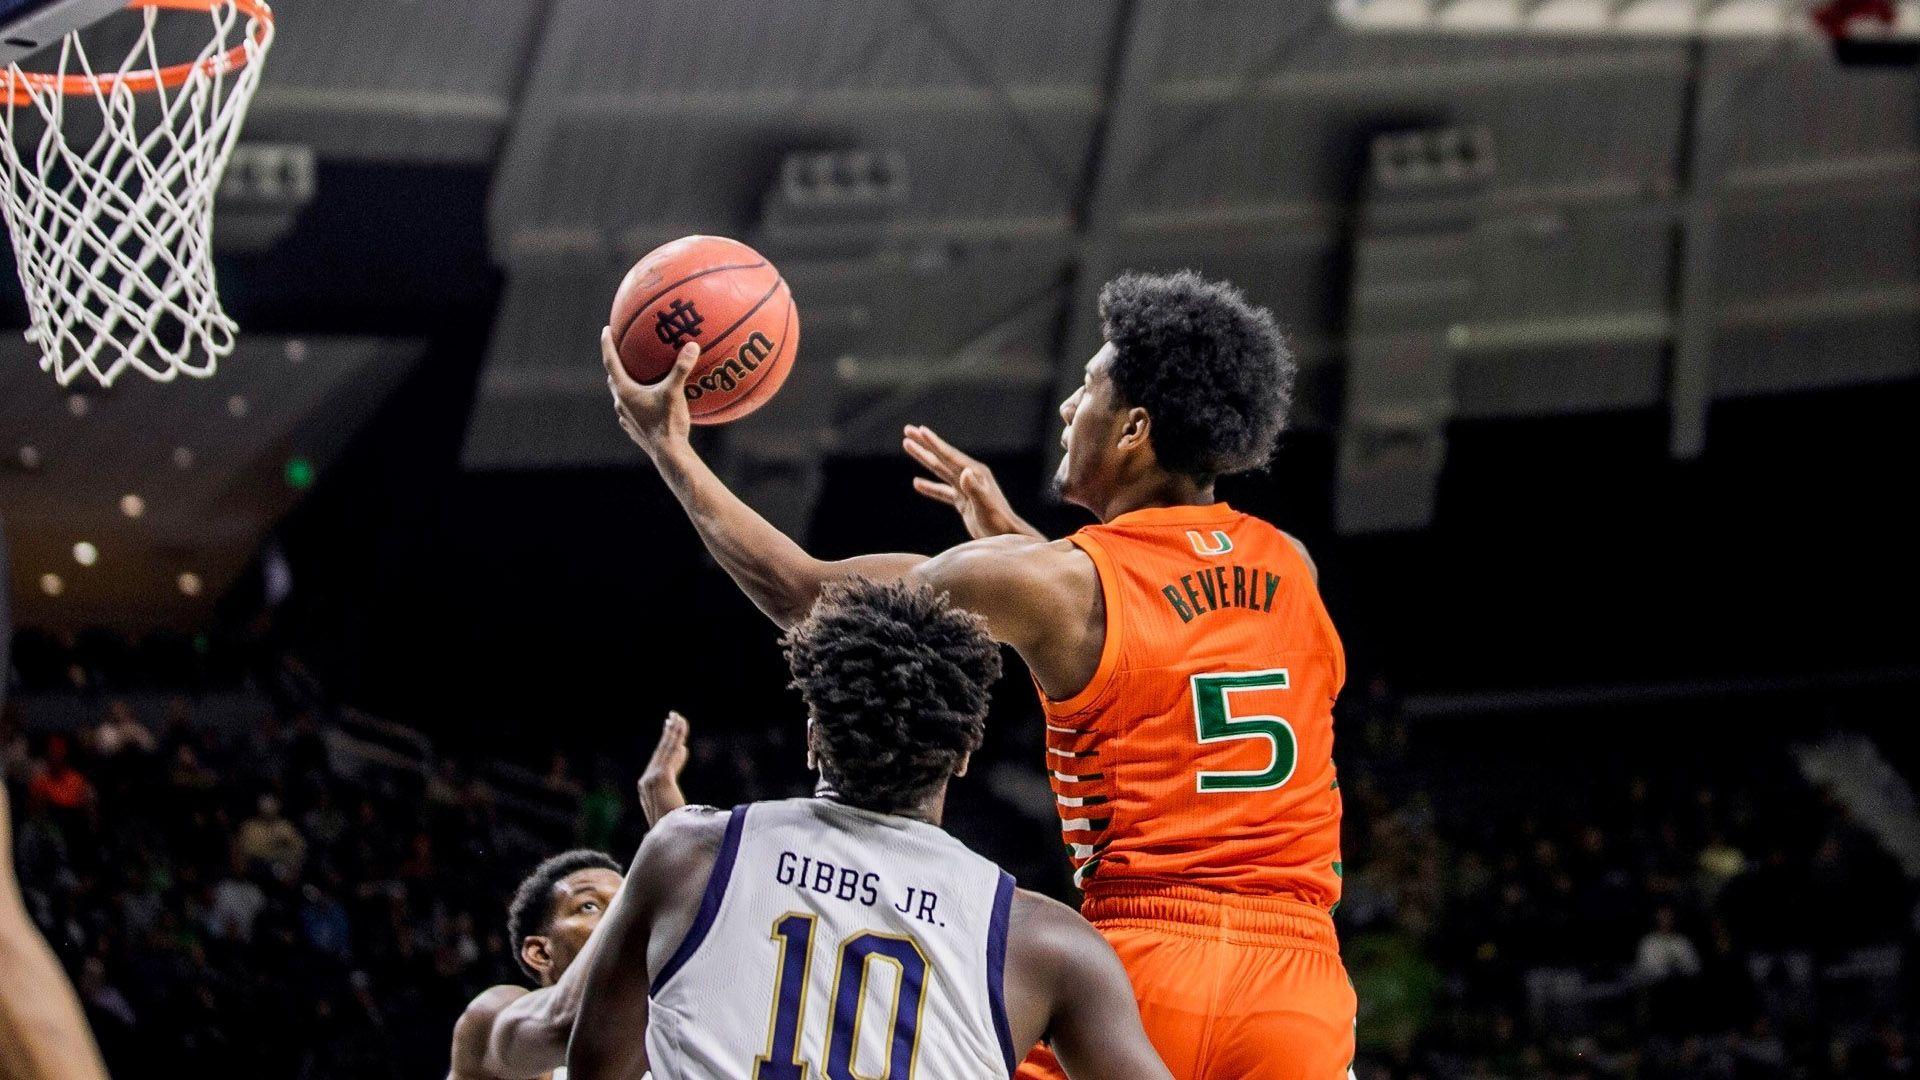 MBB Drops 87-71 Decision at Notre Dame